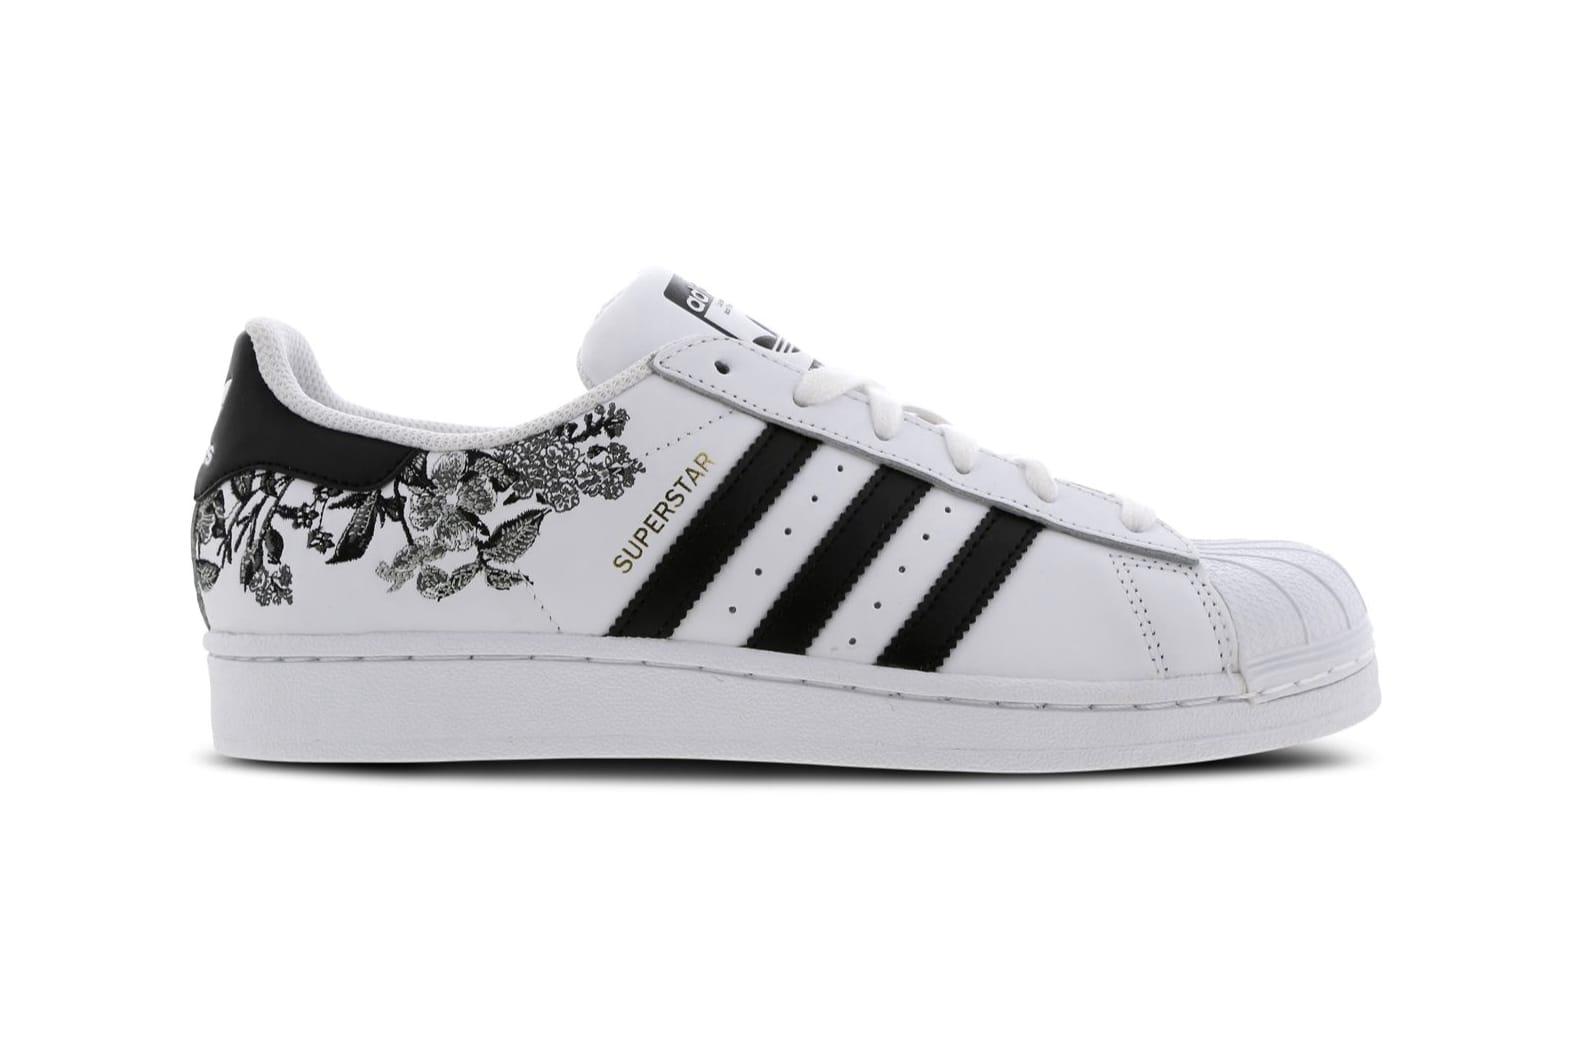 adidas Originals Floral Superstar 80s Sneakers